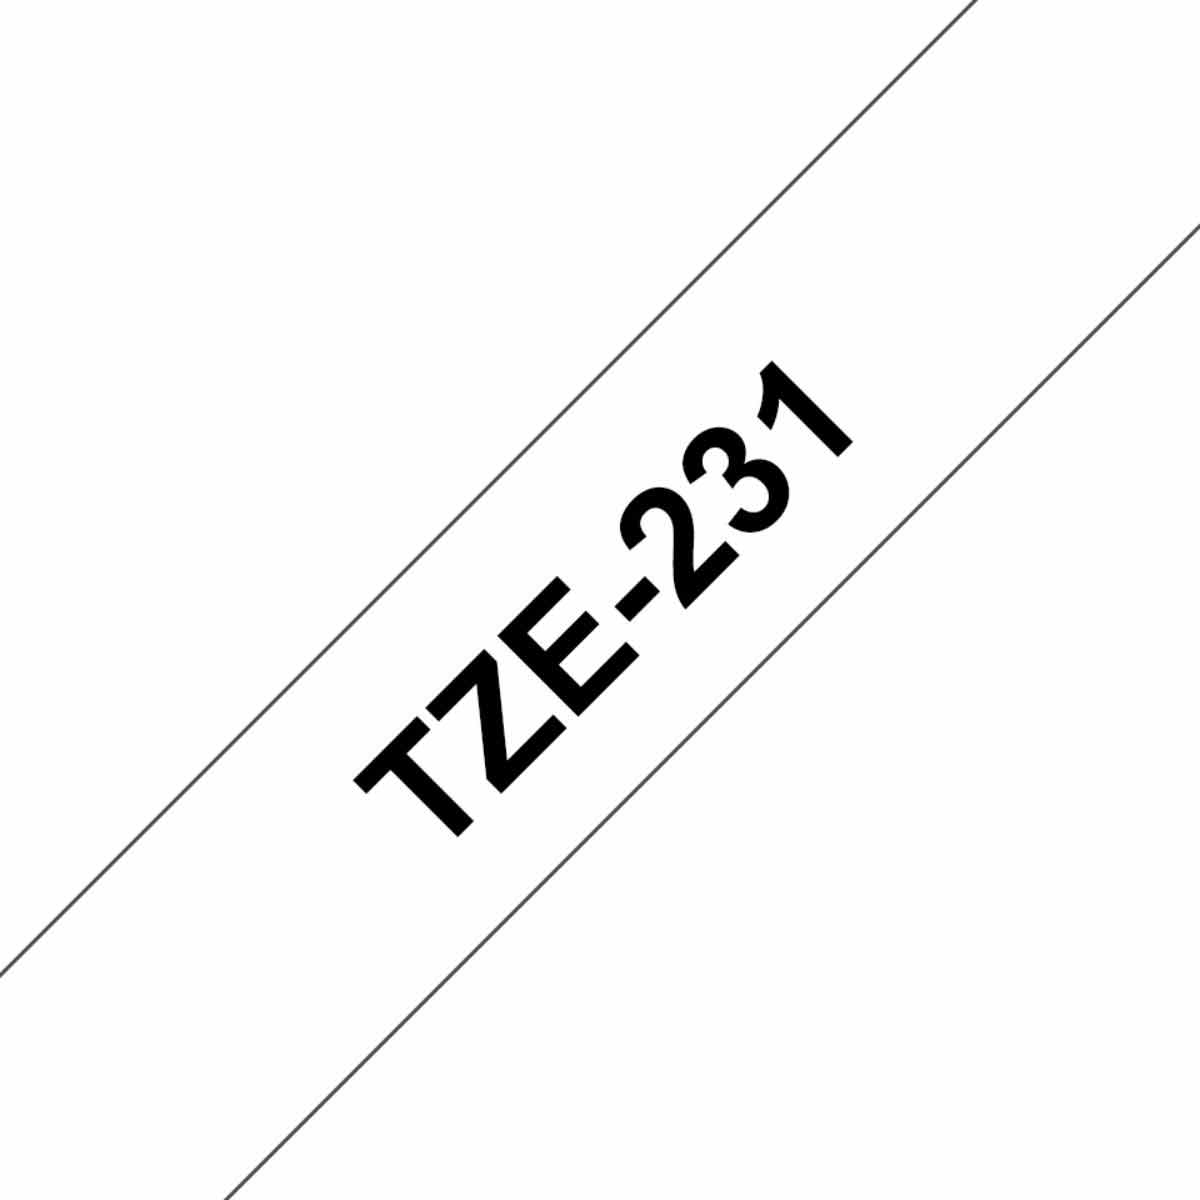 Brother TZ231 Labeller Tapes 12mm, Black/White